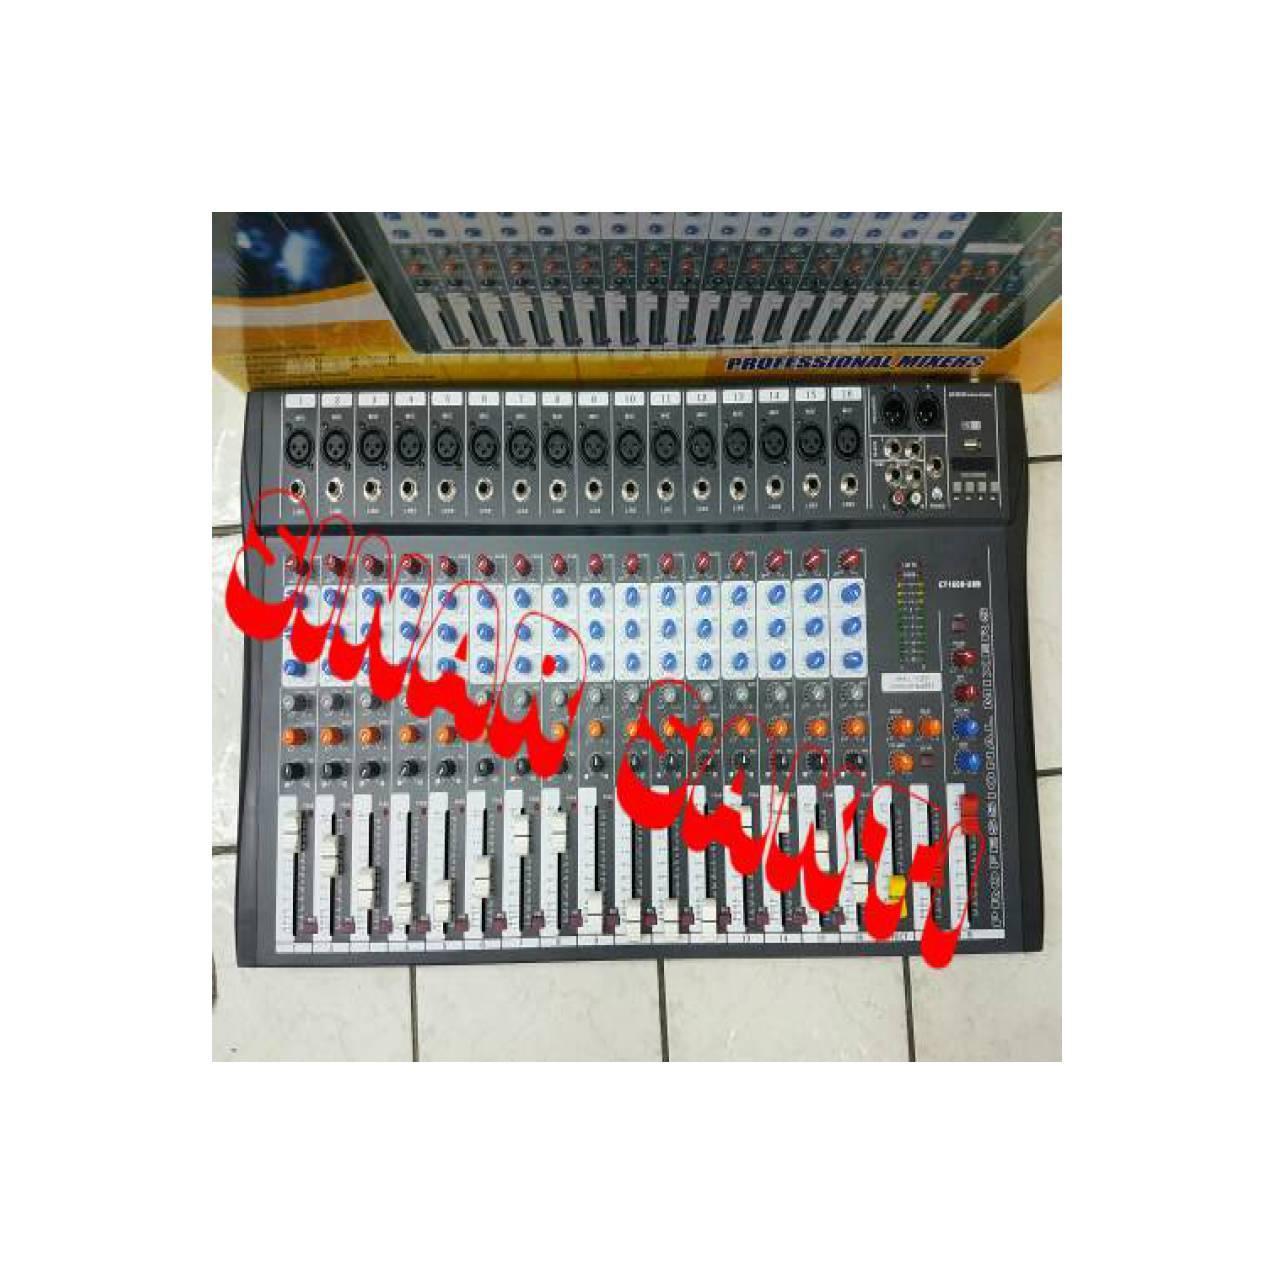 Murah Mixer CT 160s USB ( 16 Channel Full Mono )